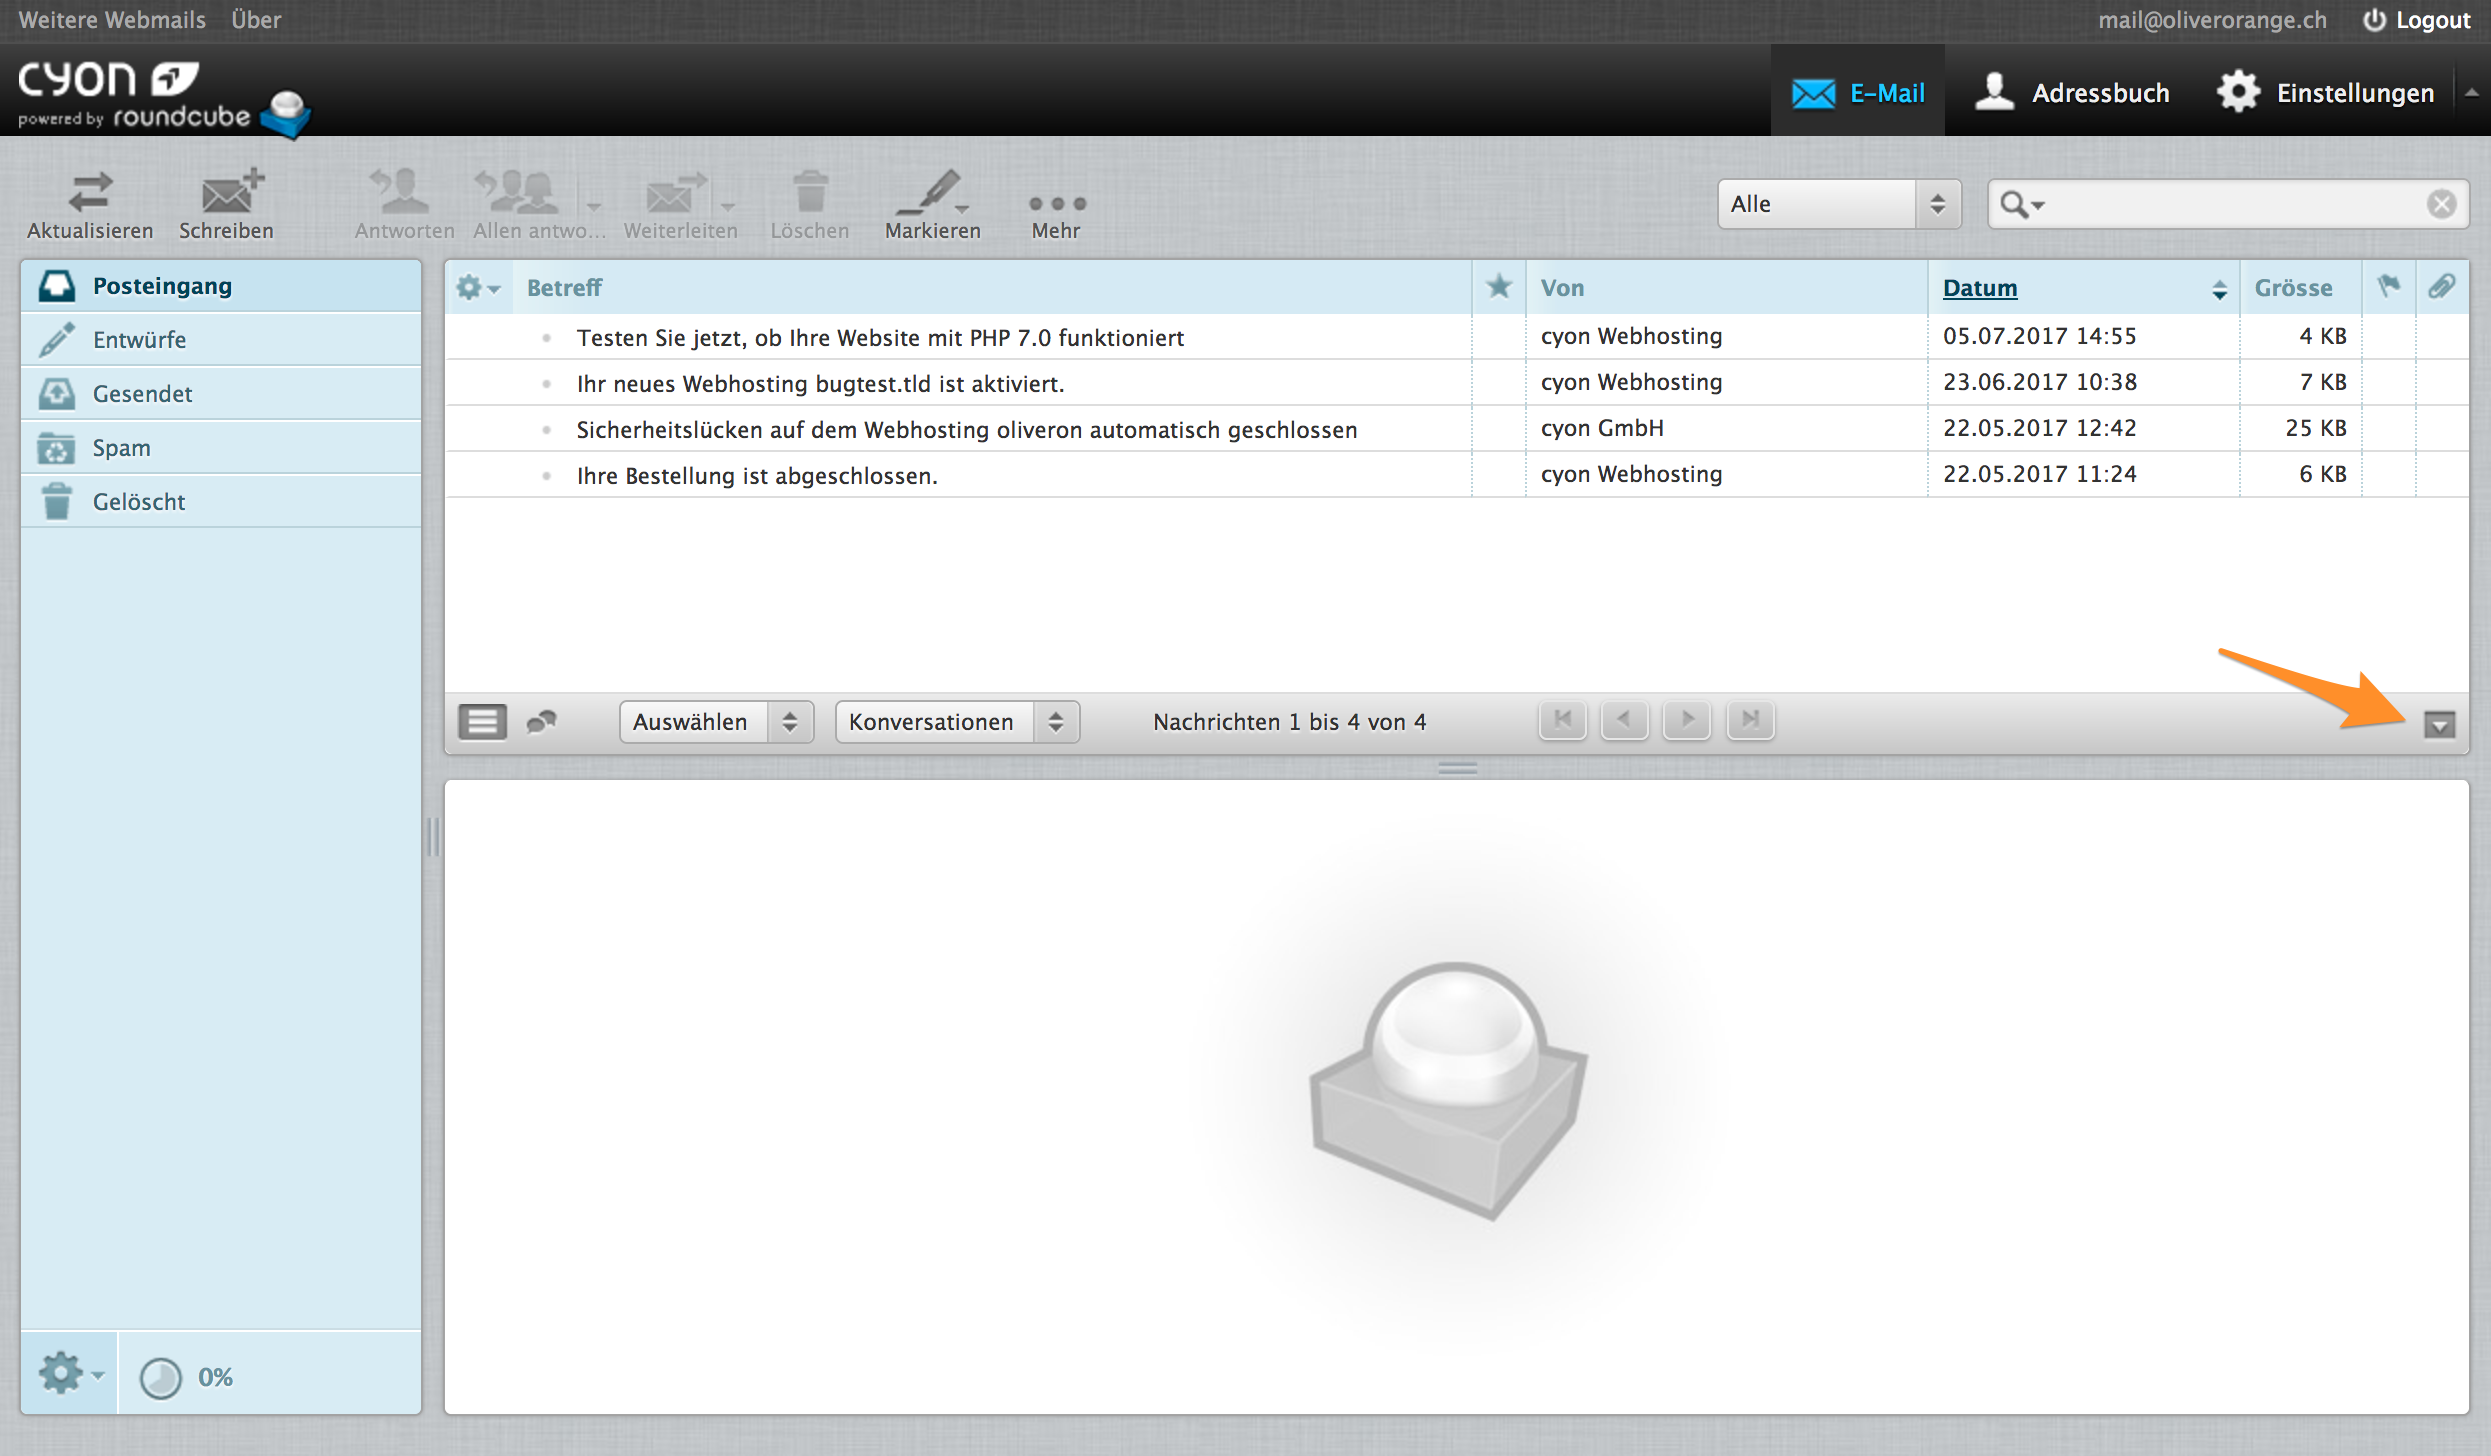 E-Mail-Vorschau ausblenden